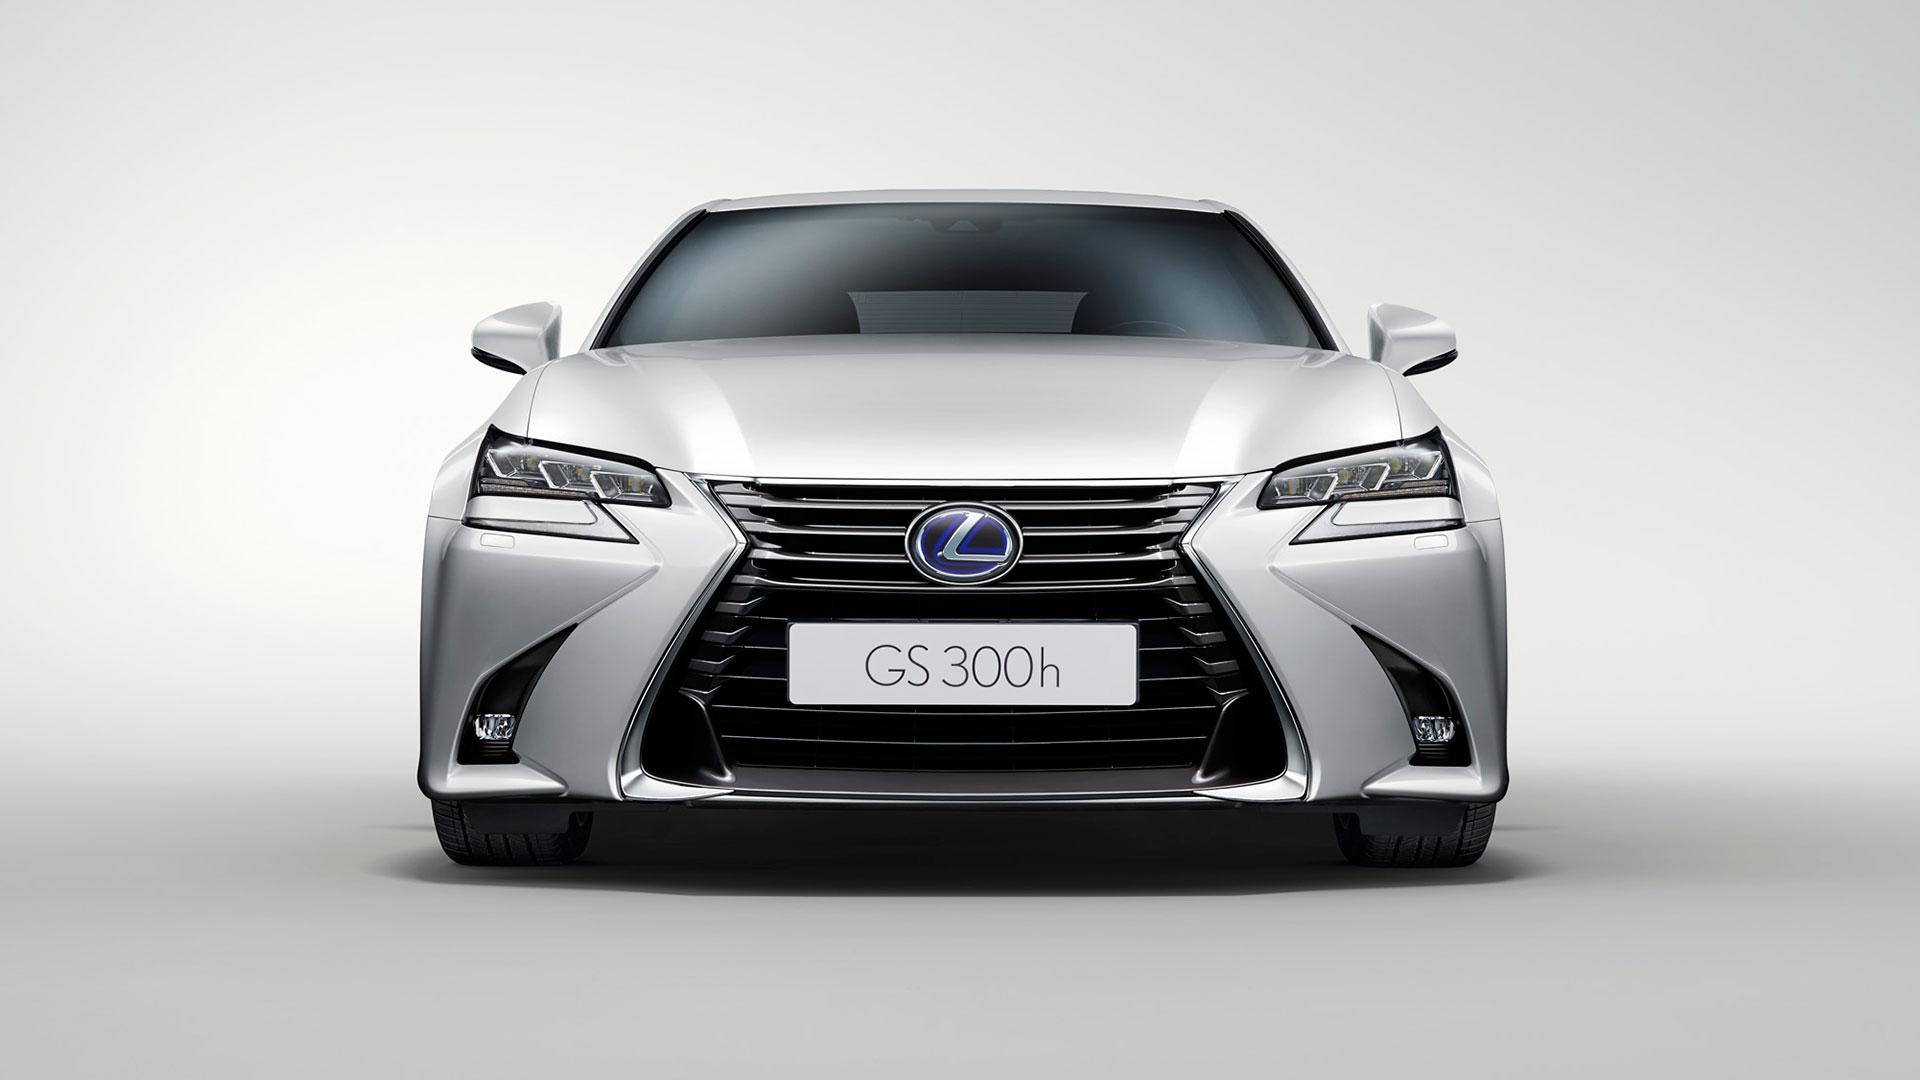 Lexus GS 300h más ecológico hero asset